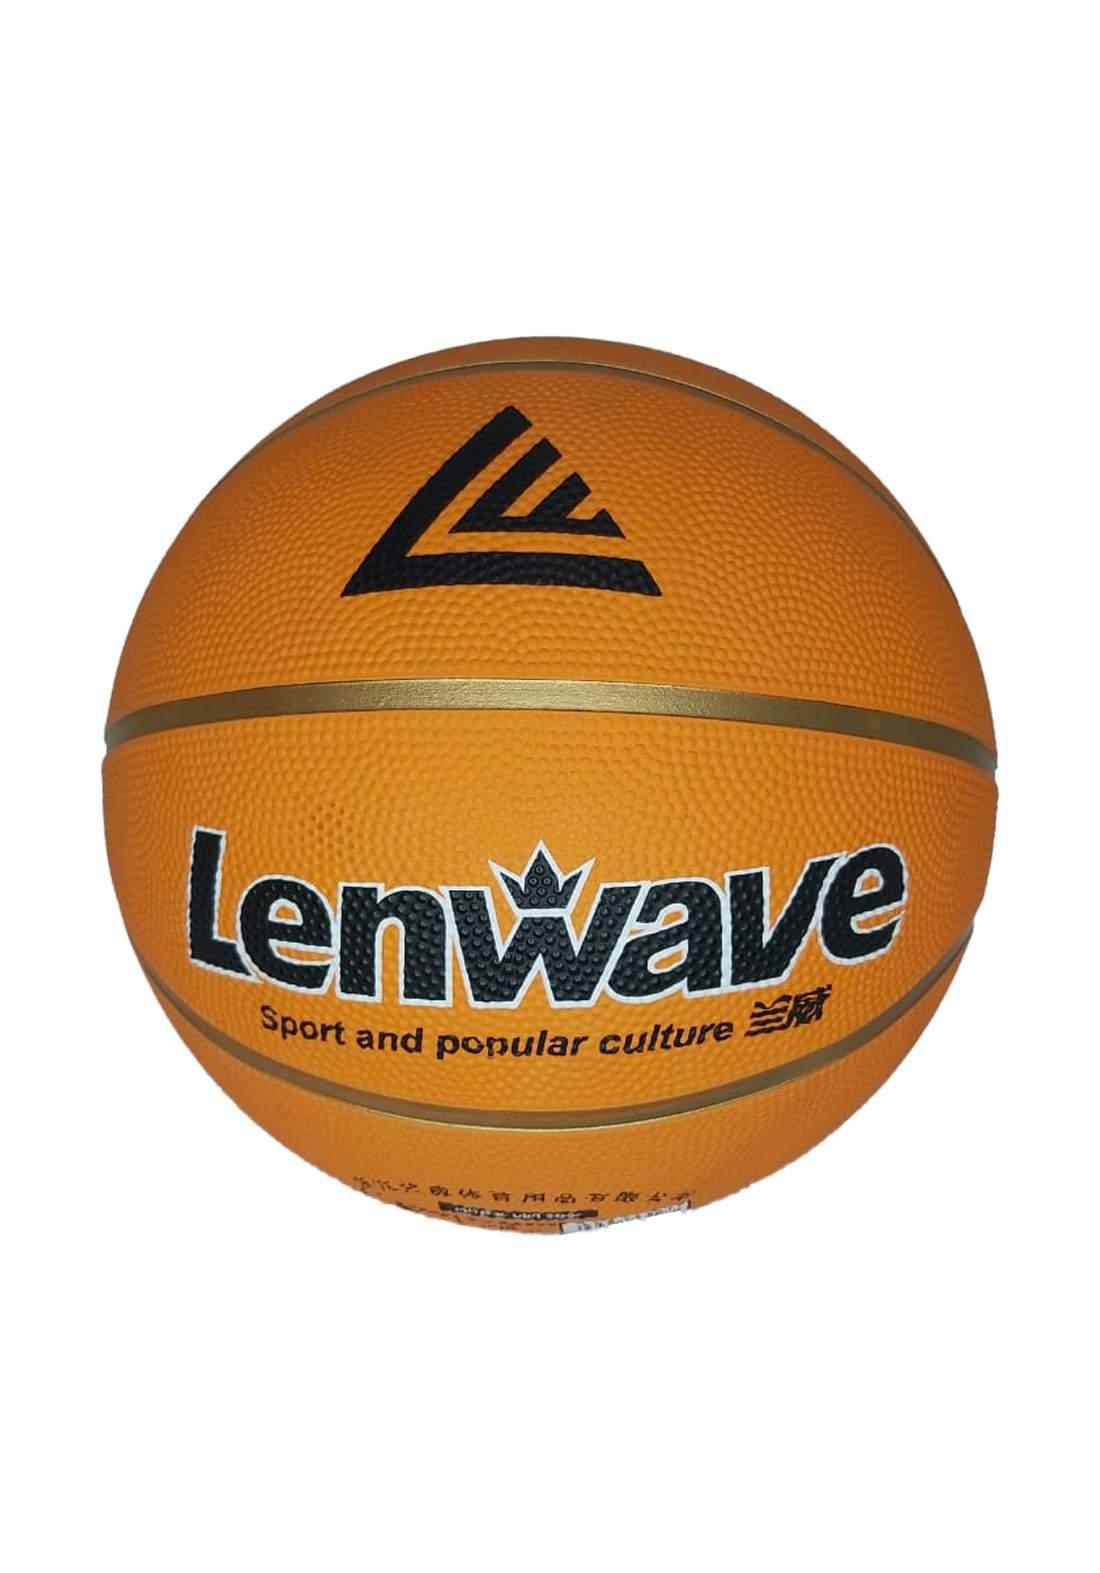 Lenwave Basketball Sport And Popular Culture 760mm كرة سلة